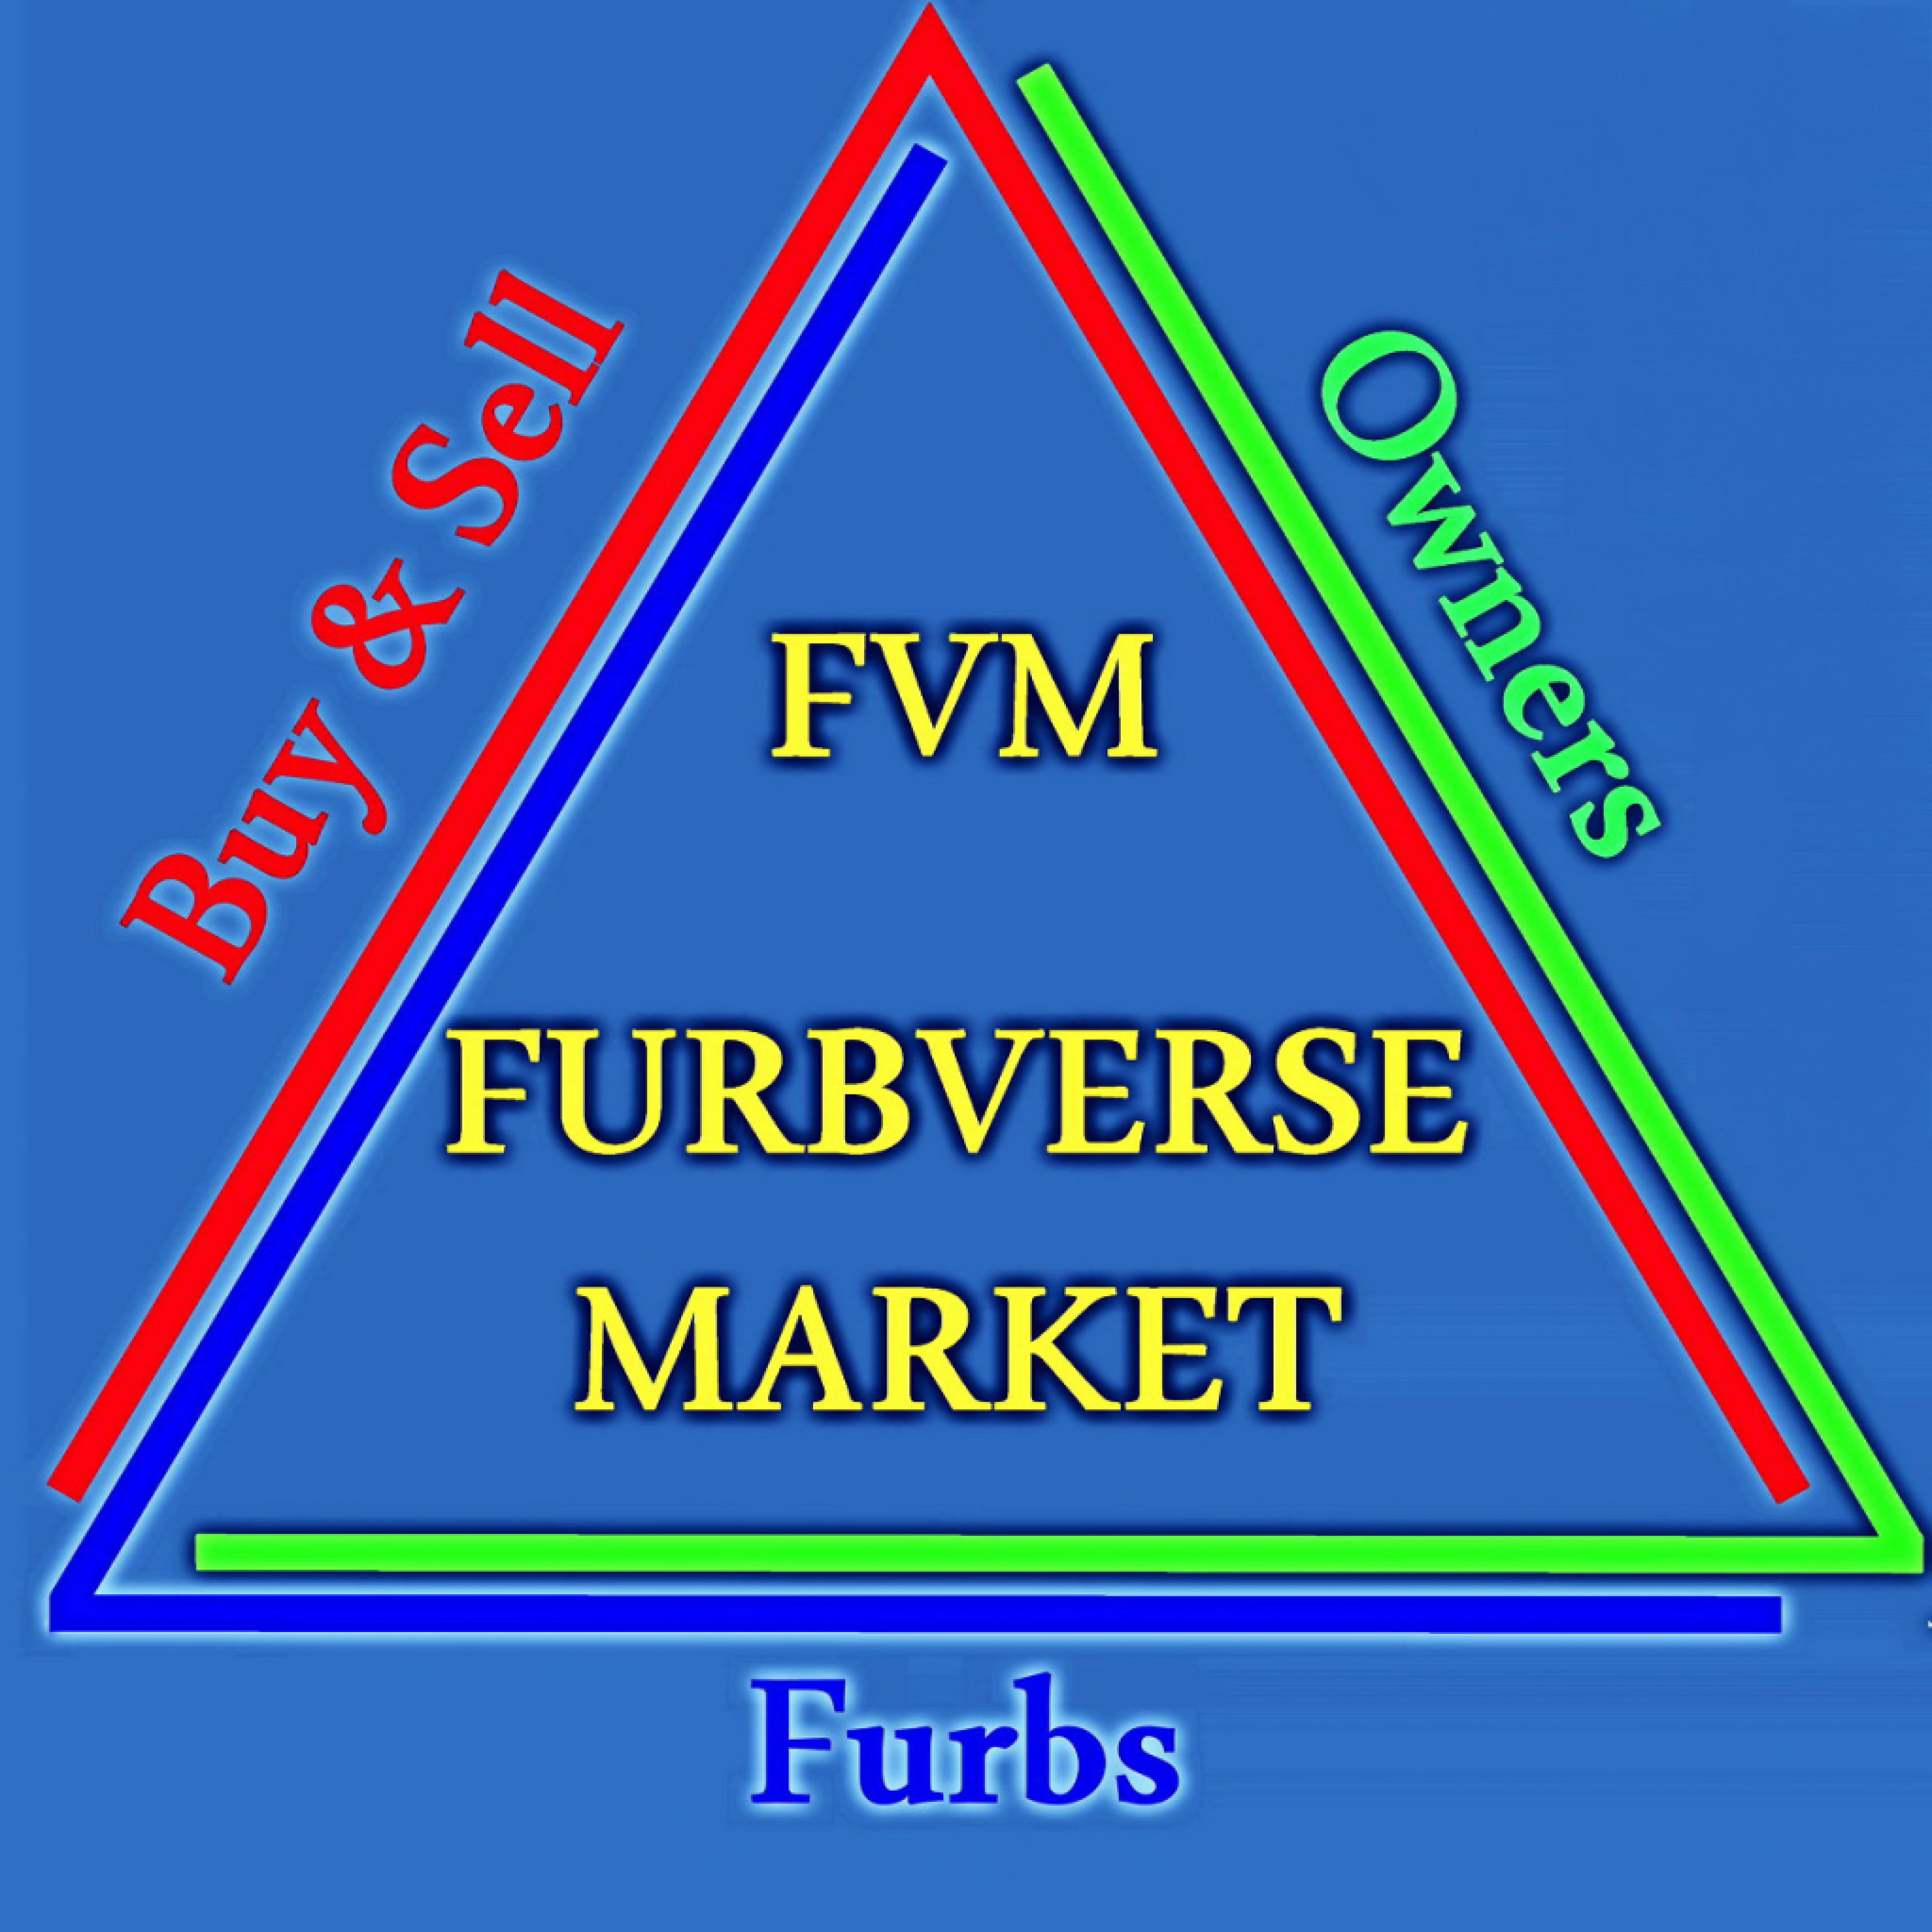 FurbVerse Market